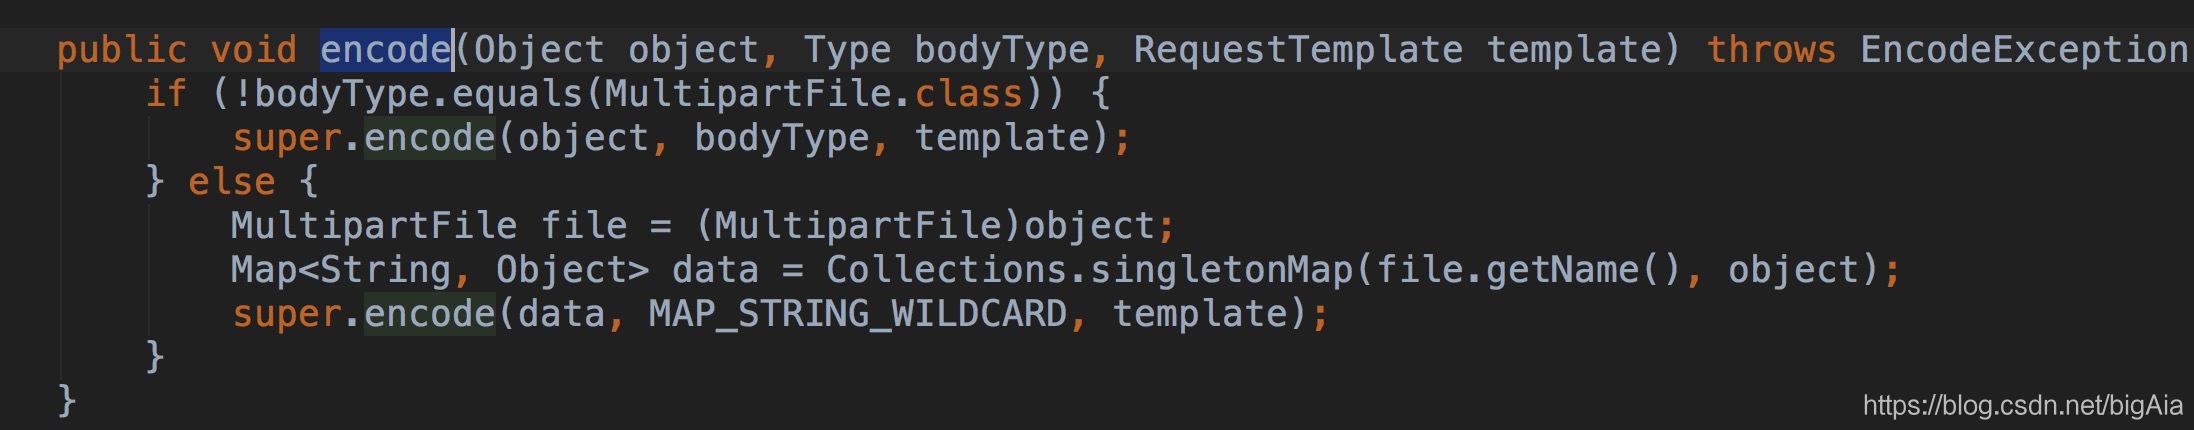 SpringFormEncoder的encode方法